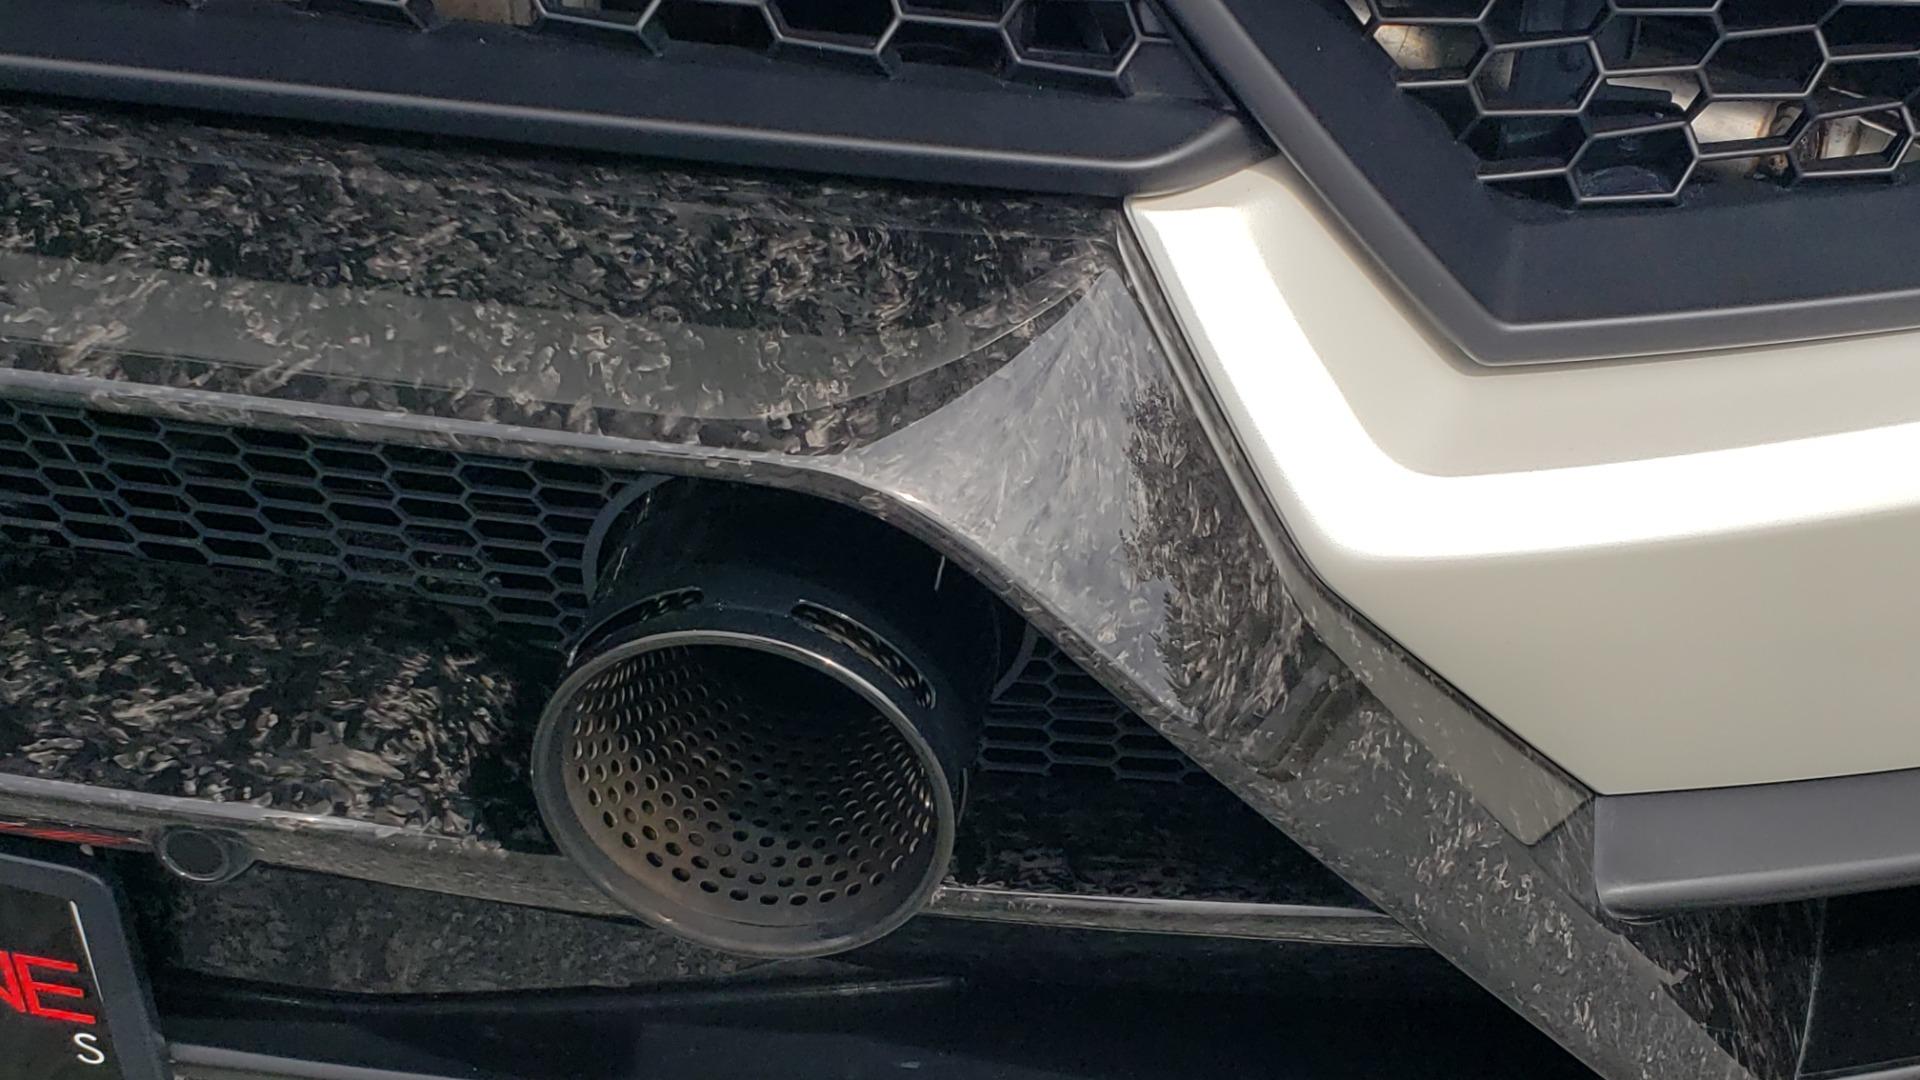 Used 2018 Lamborghini HURACAN PERFORMANTE 5.2L V10 / 630HP / 7-SPD AUTO / AWD / NAV / PREM SND for sale $269,995 at Formula Imports in Charlotte NC 28227 41